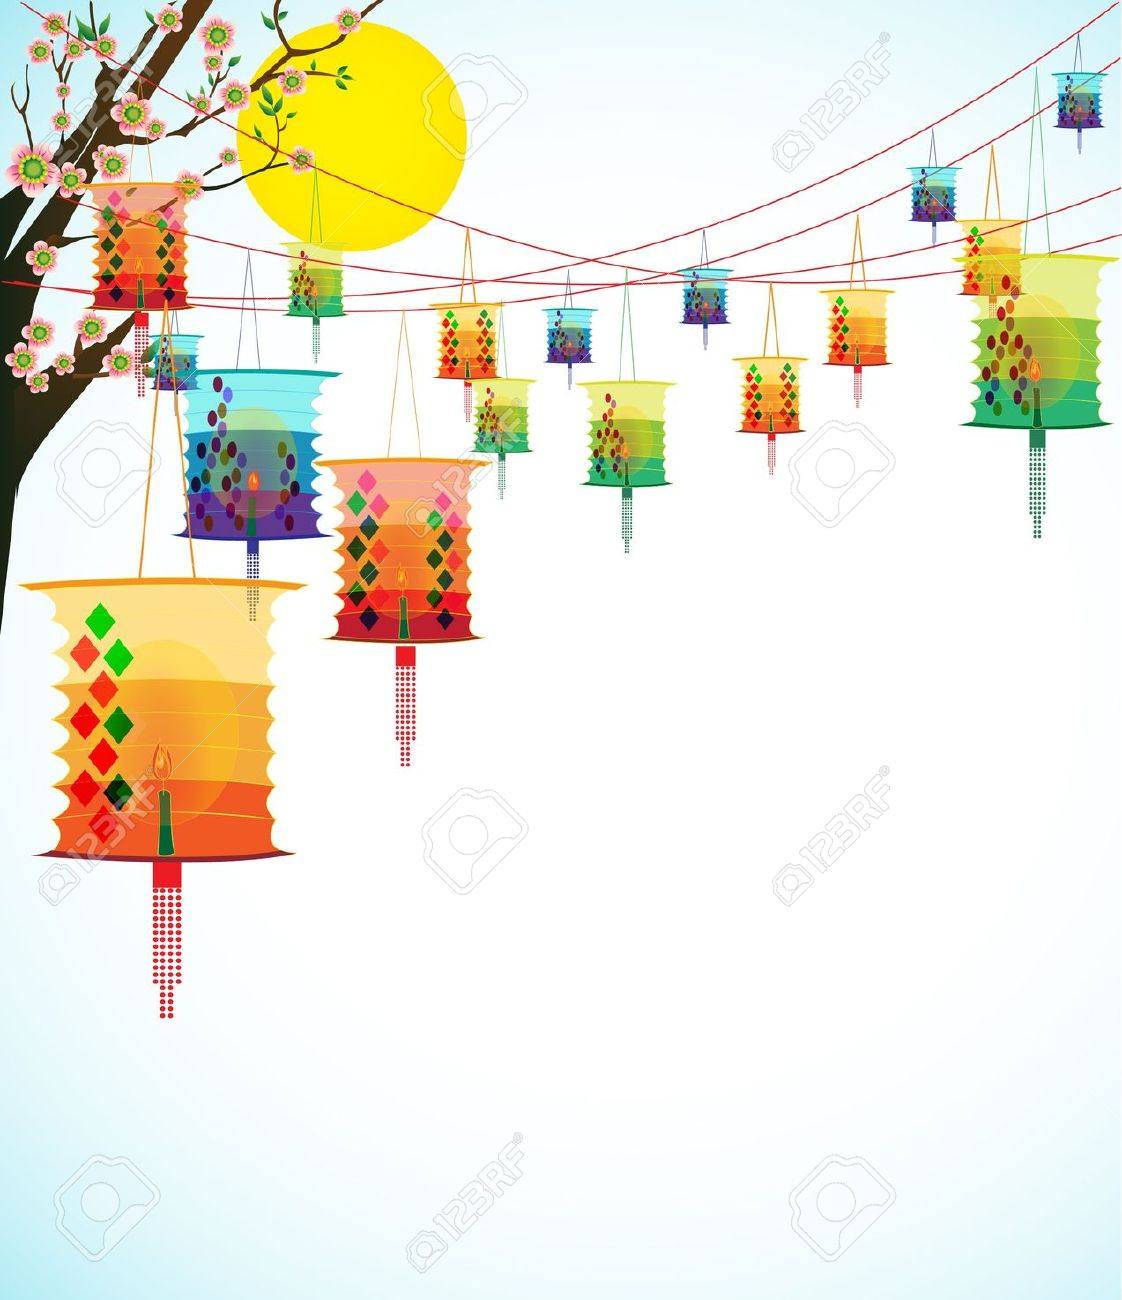 Clipart lantern festival.